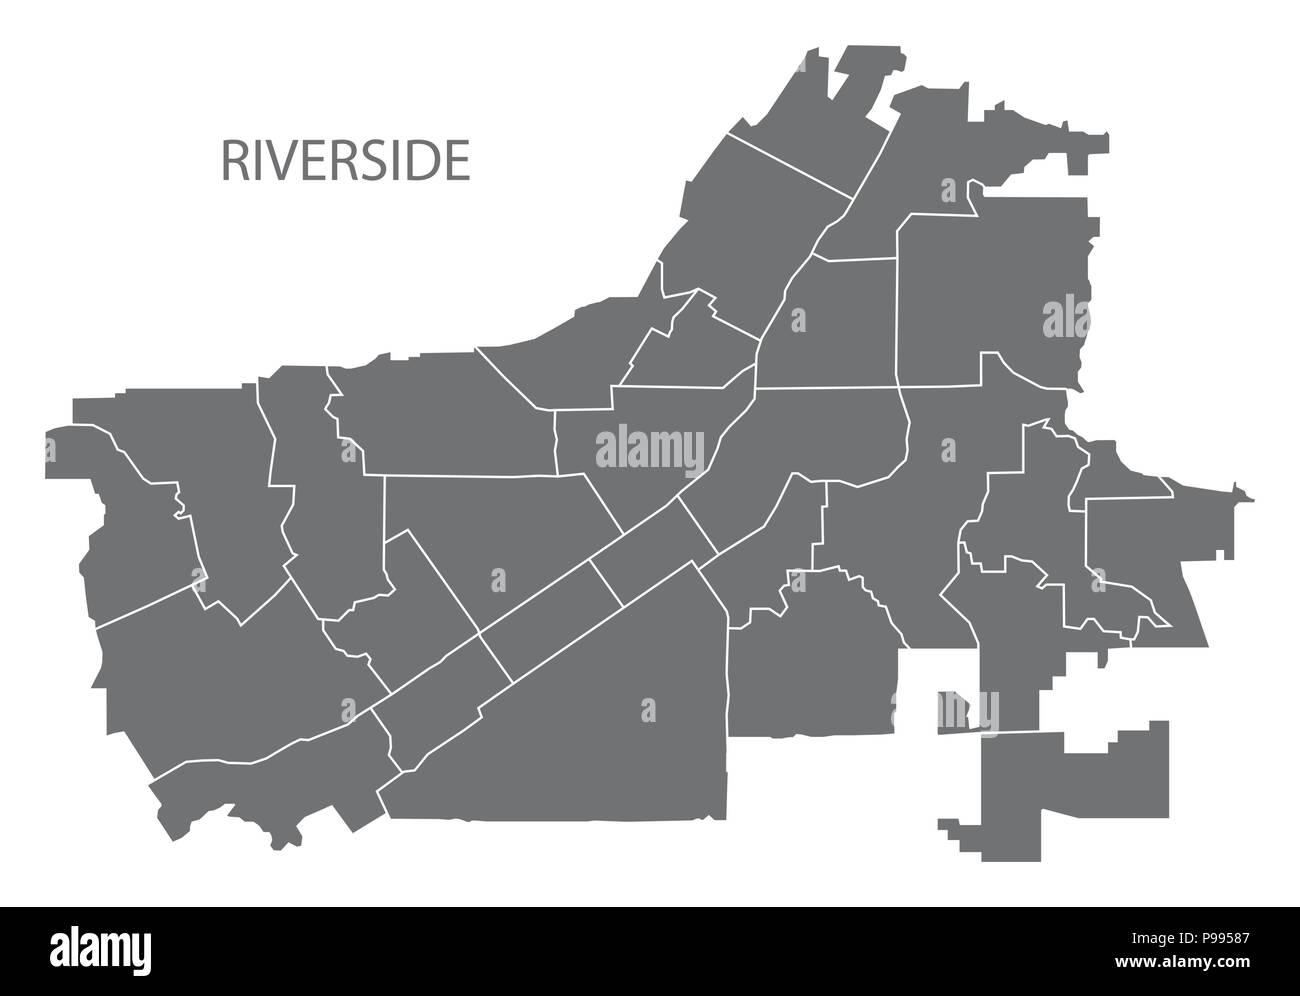 Riverside California city map with neighborhoods grey illustration on